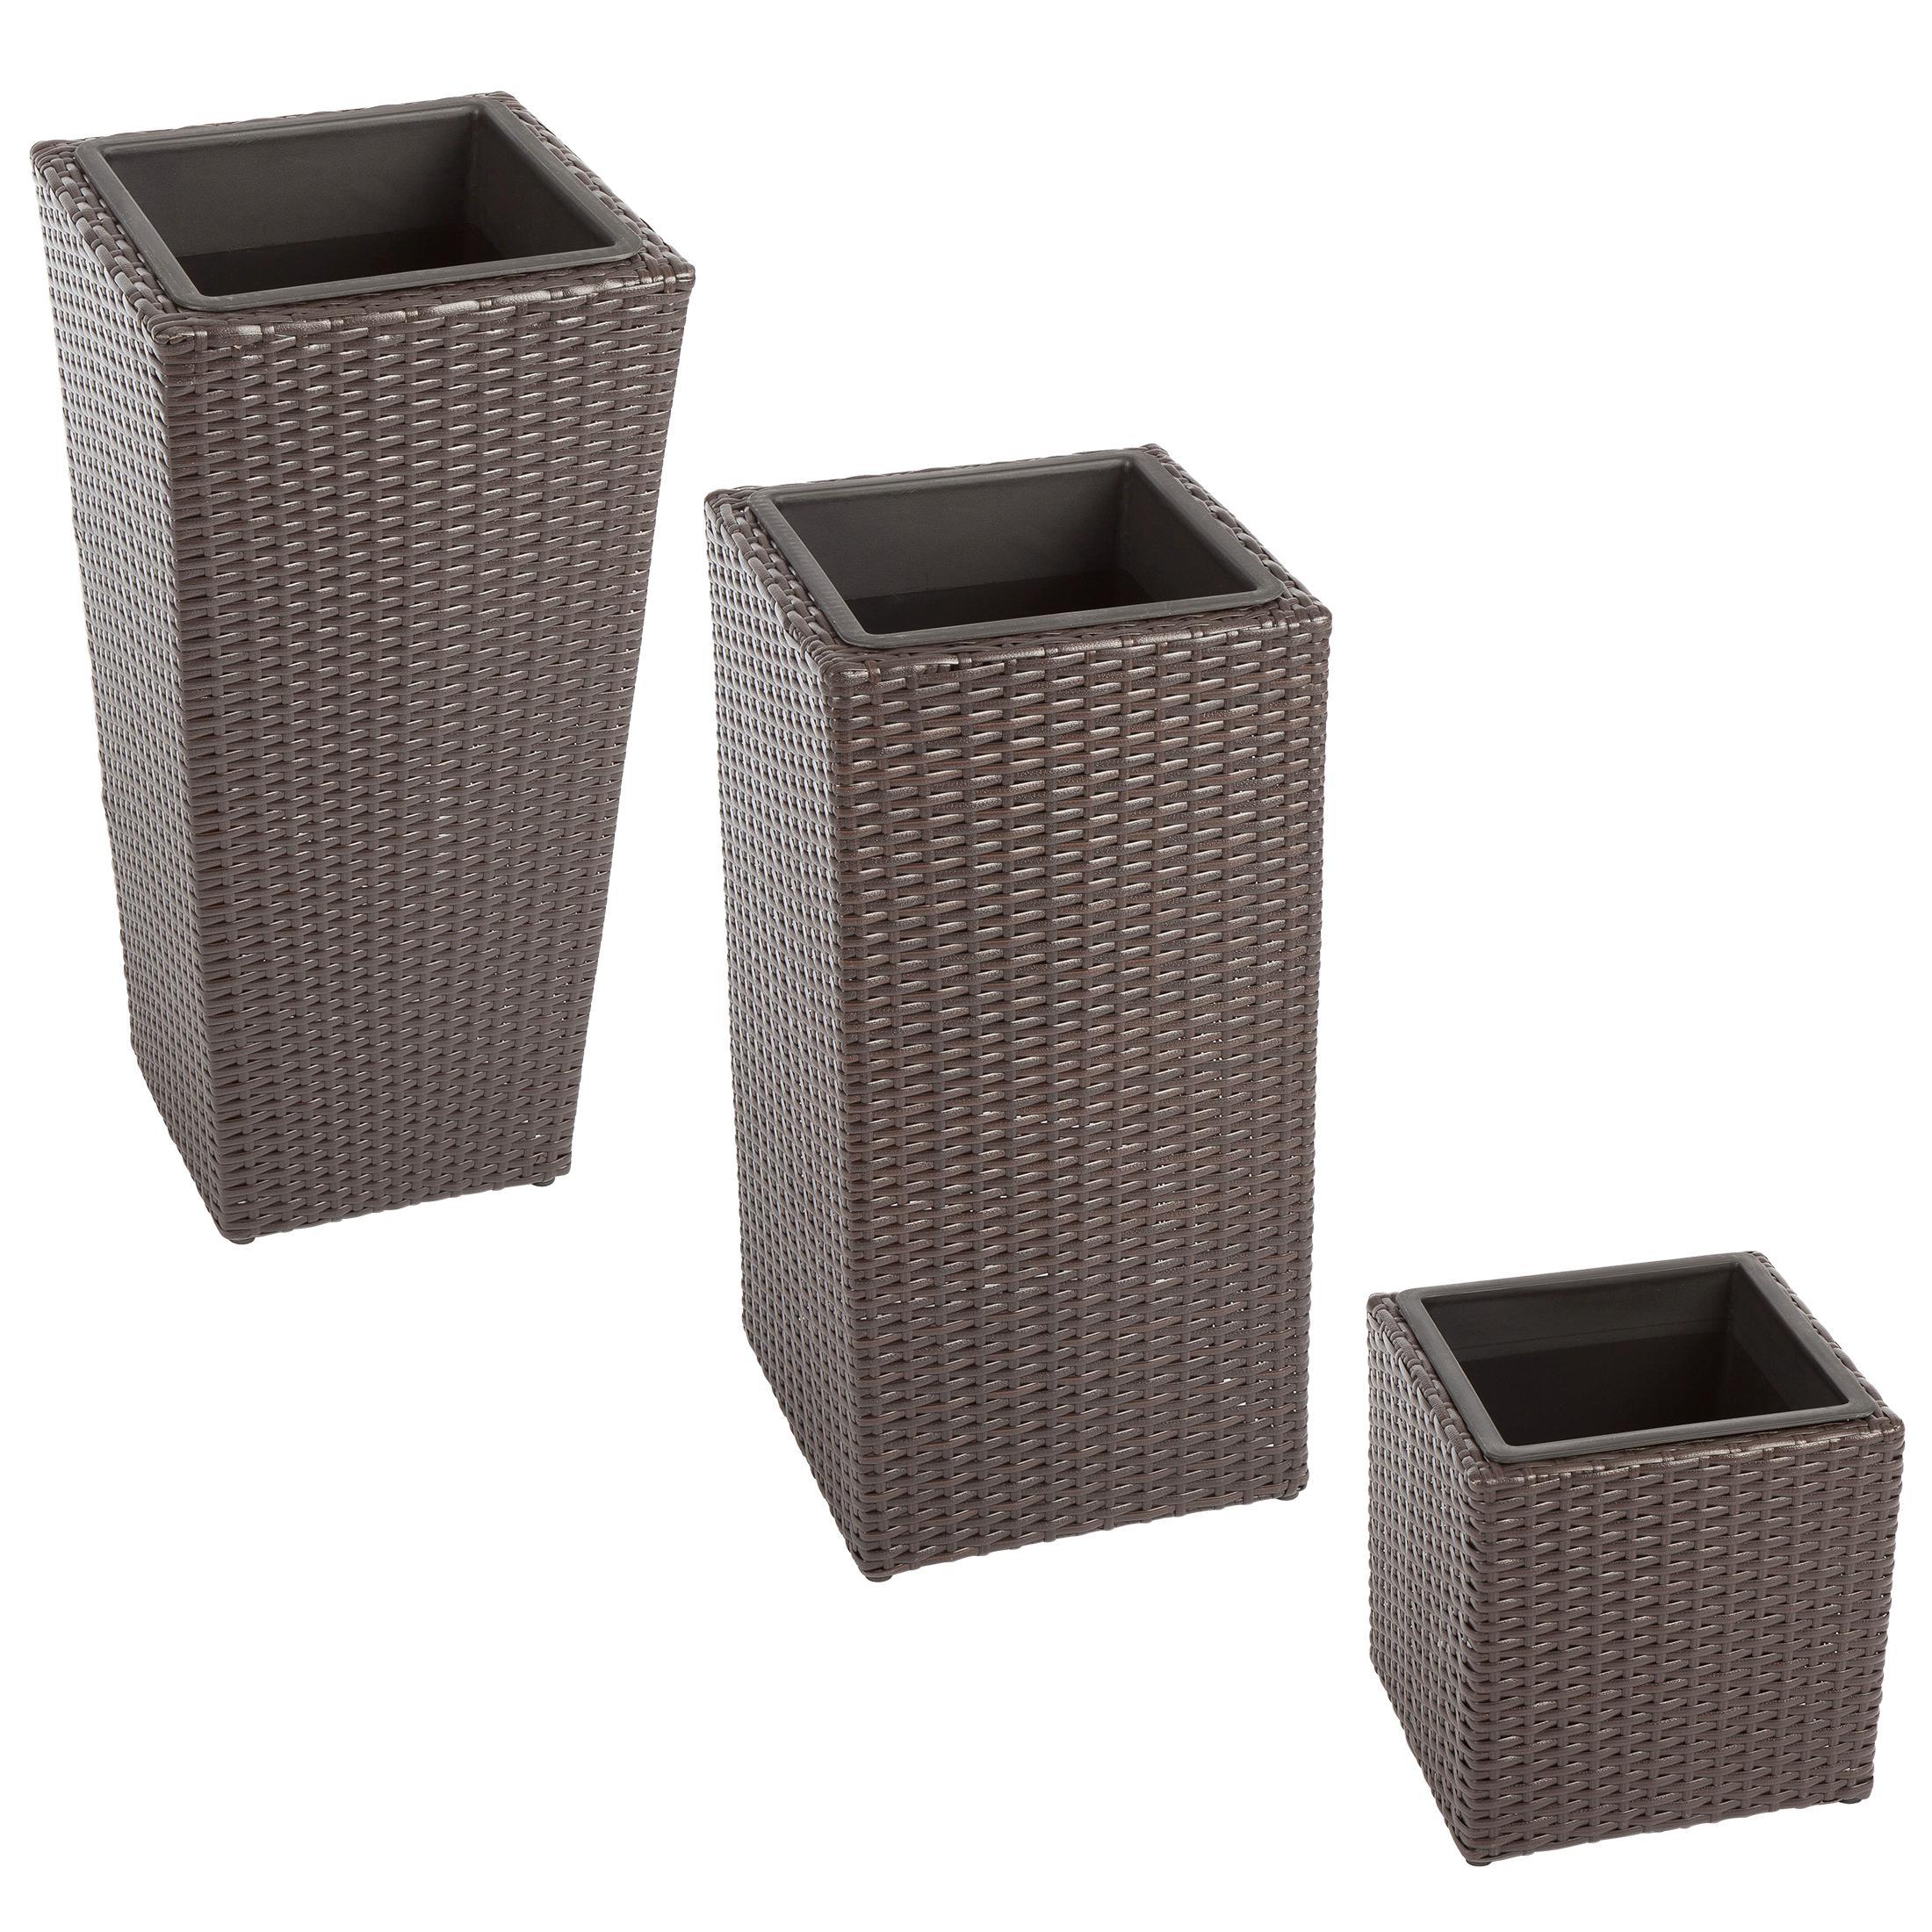 ultranatura 200100000117 poly rattan pflanzk bel klein. Black Bedroom Furniture Sets. Home Design Ideas